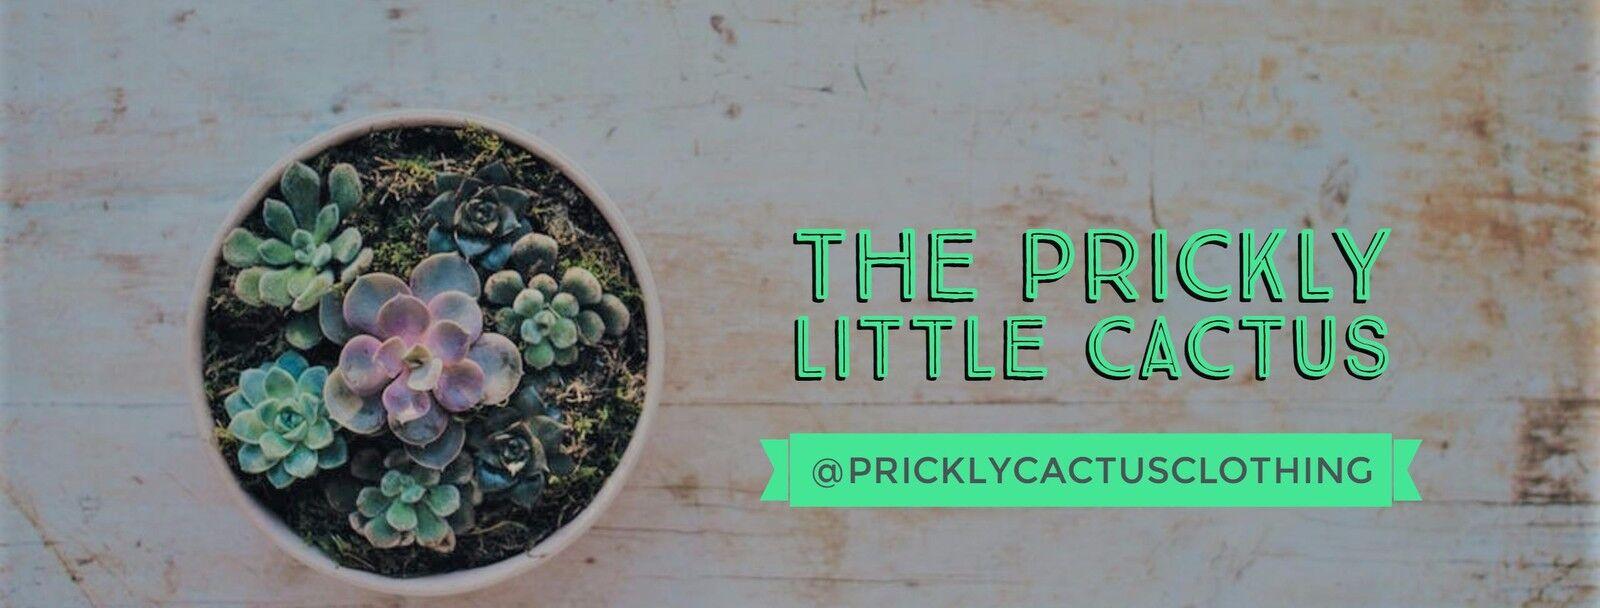 Prickly Cactus Clothing